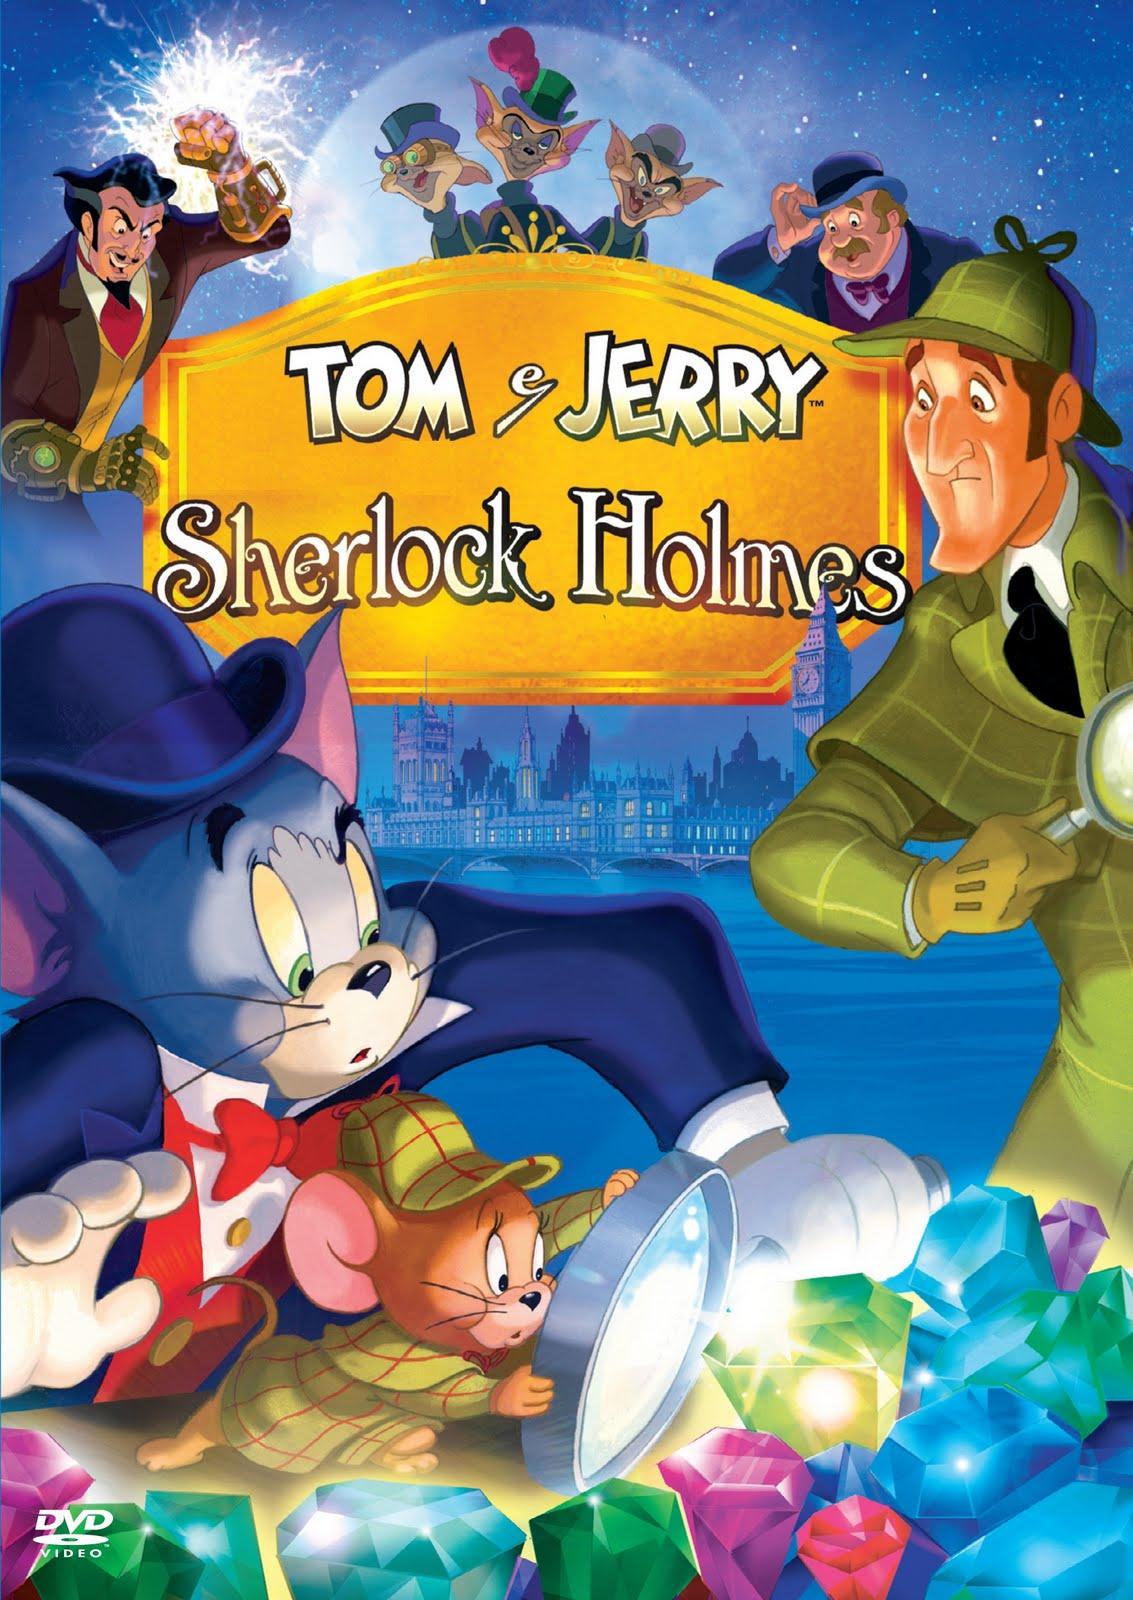 http://3.bp.blogspot.com/_o2shM_5e3qs/TIEvZNzvfiI/AAAAAAAAADk/i3c-z6IPd20/s1600/Tom+%26+Jerry+-+Sherlock+Holmes.jpg